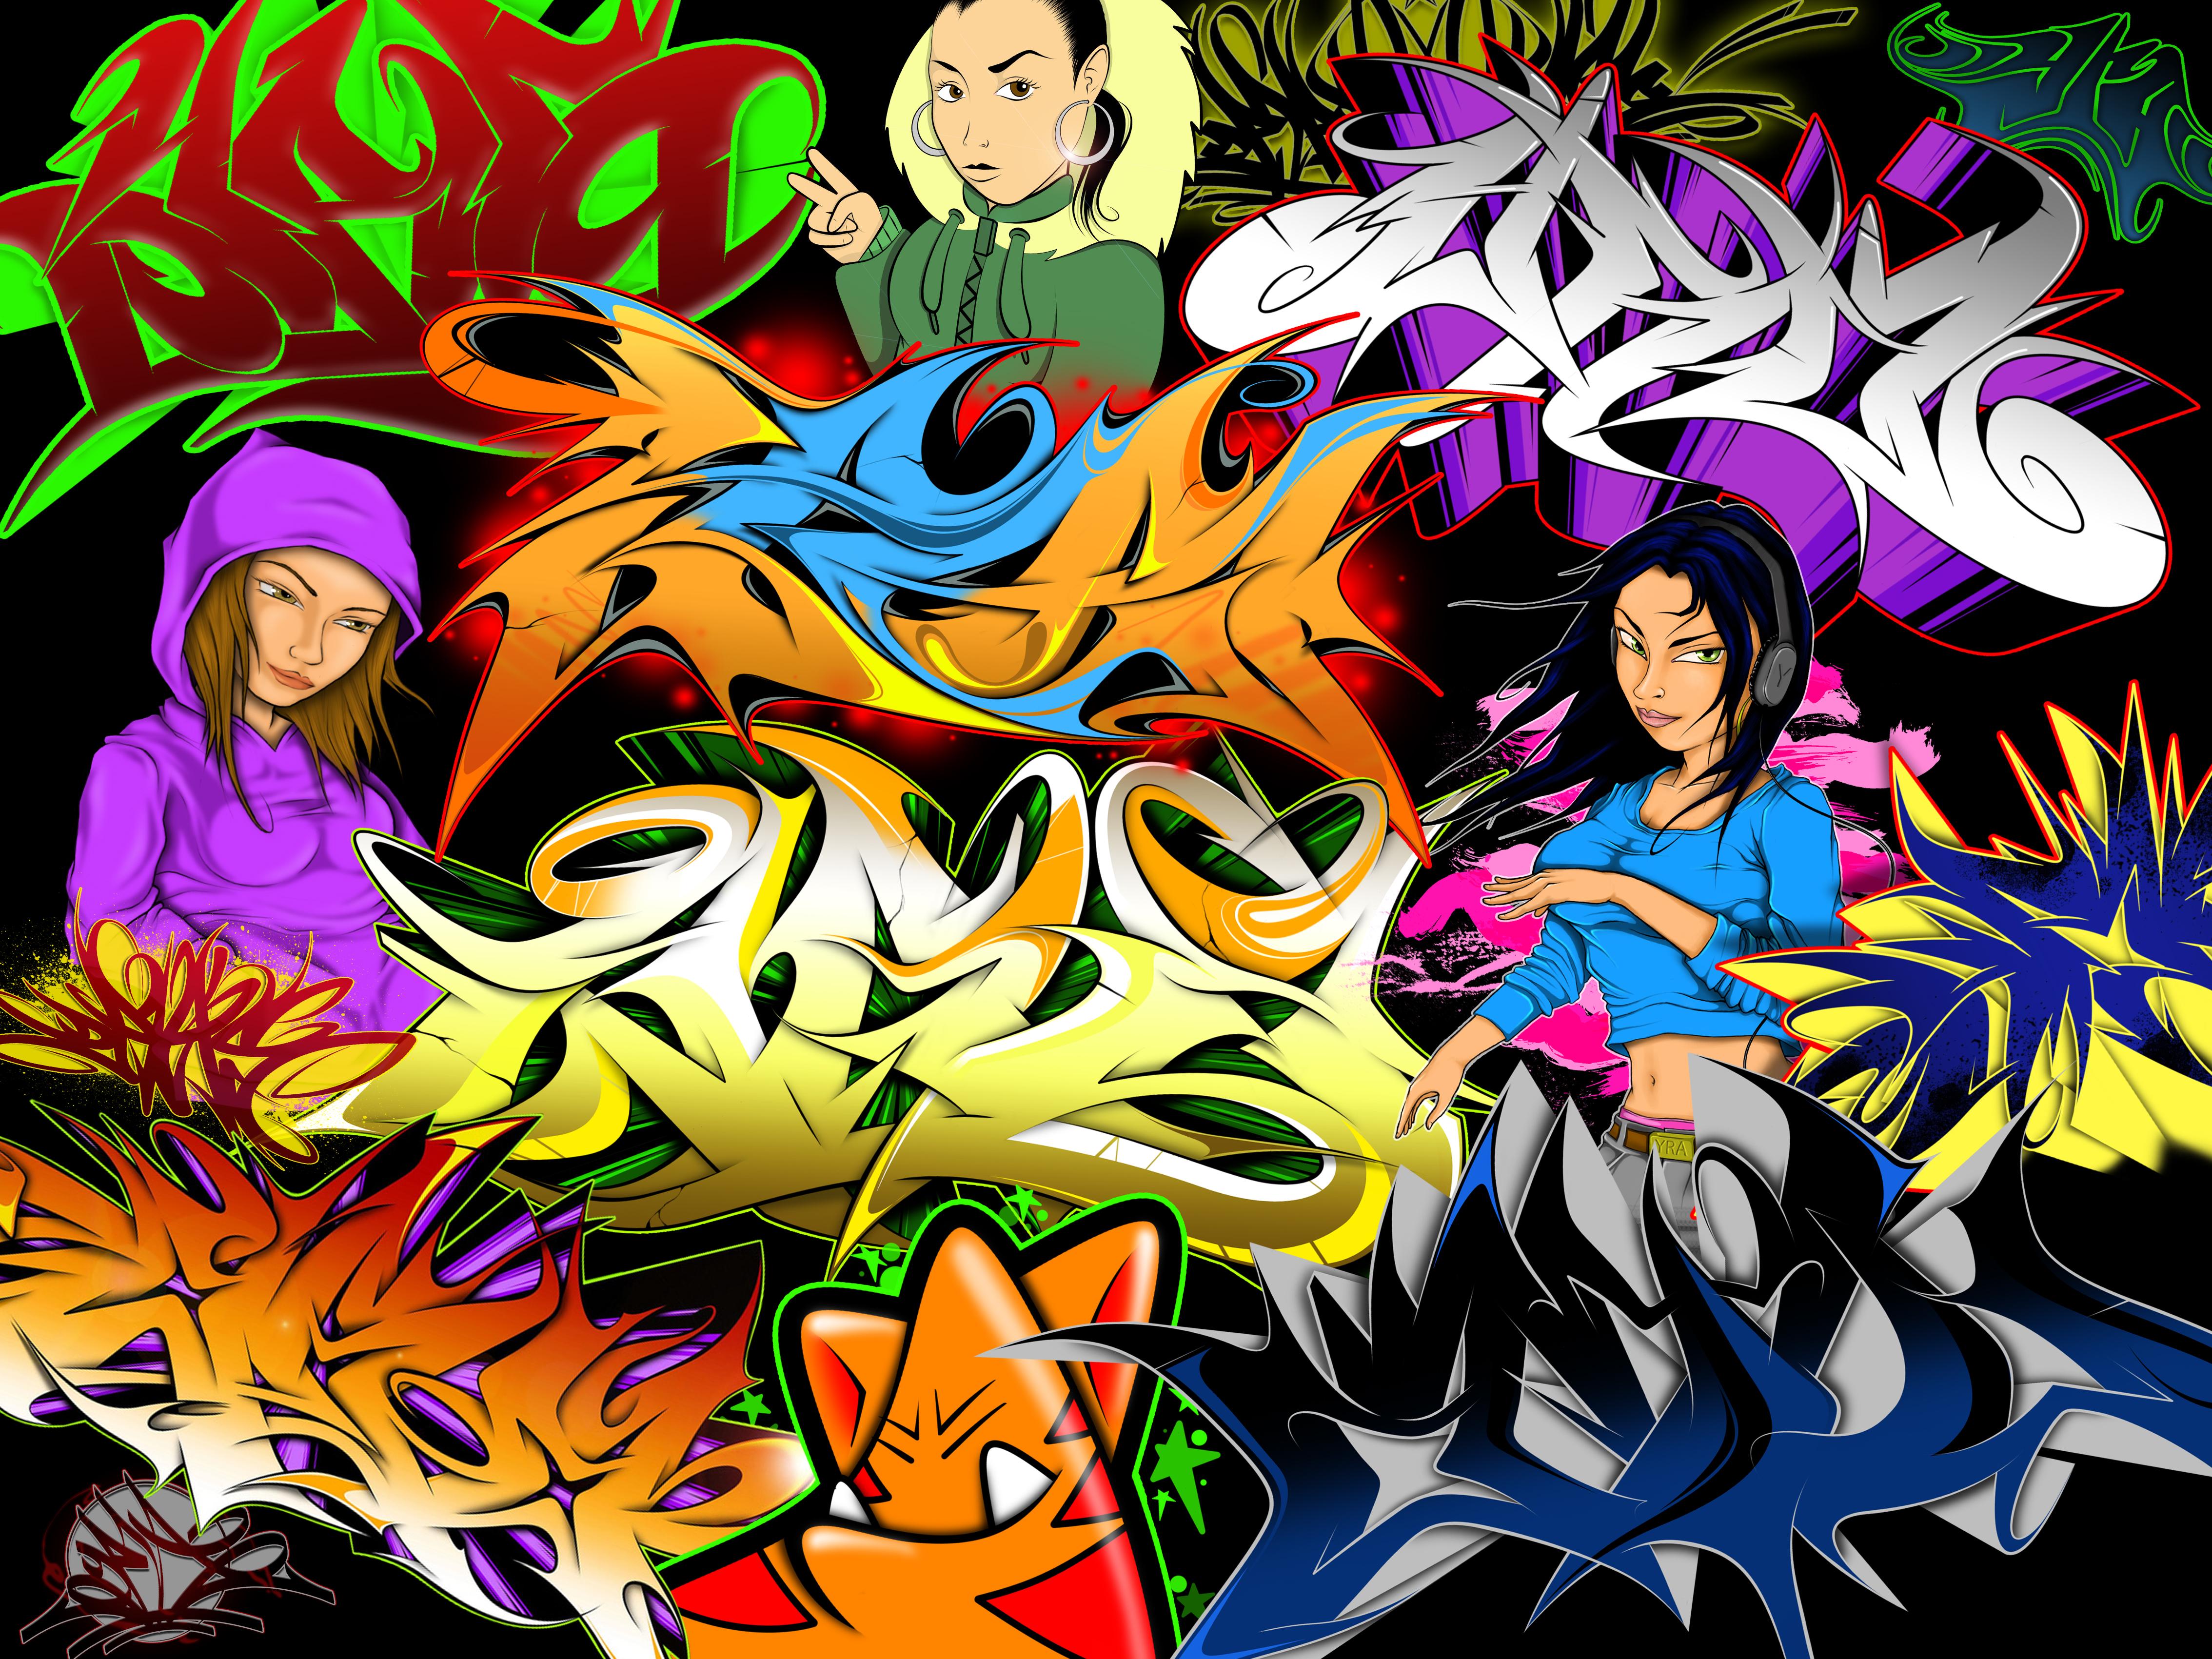 Graffiti 4k ultra hd fondo de pantalla and fondo de for Immagini graffiti hd